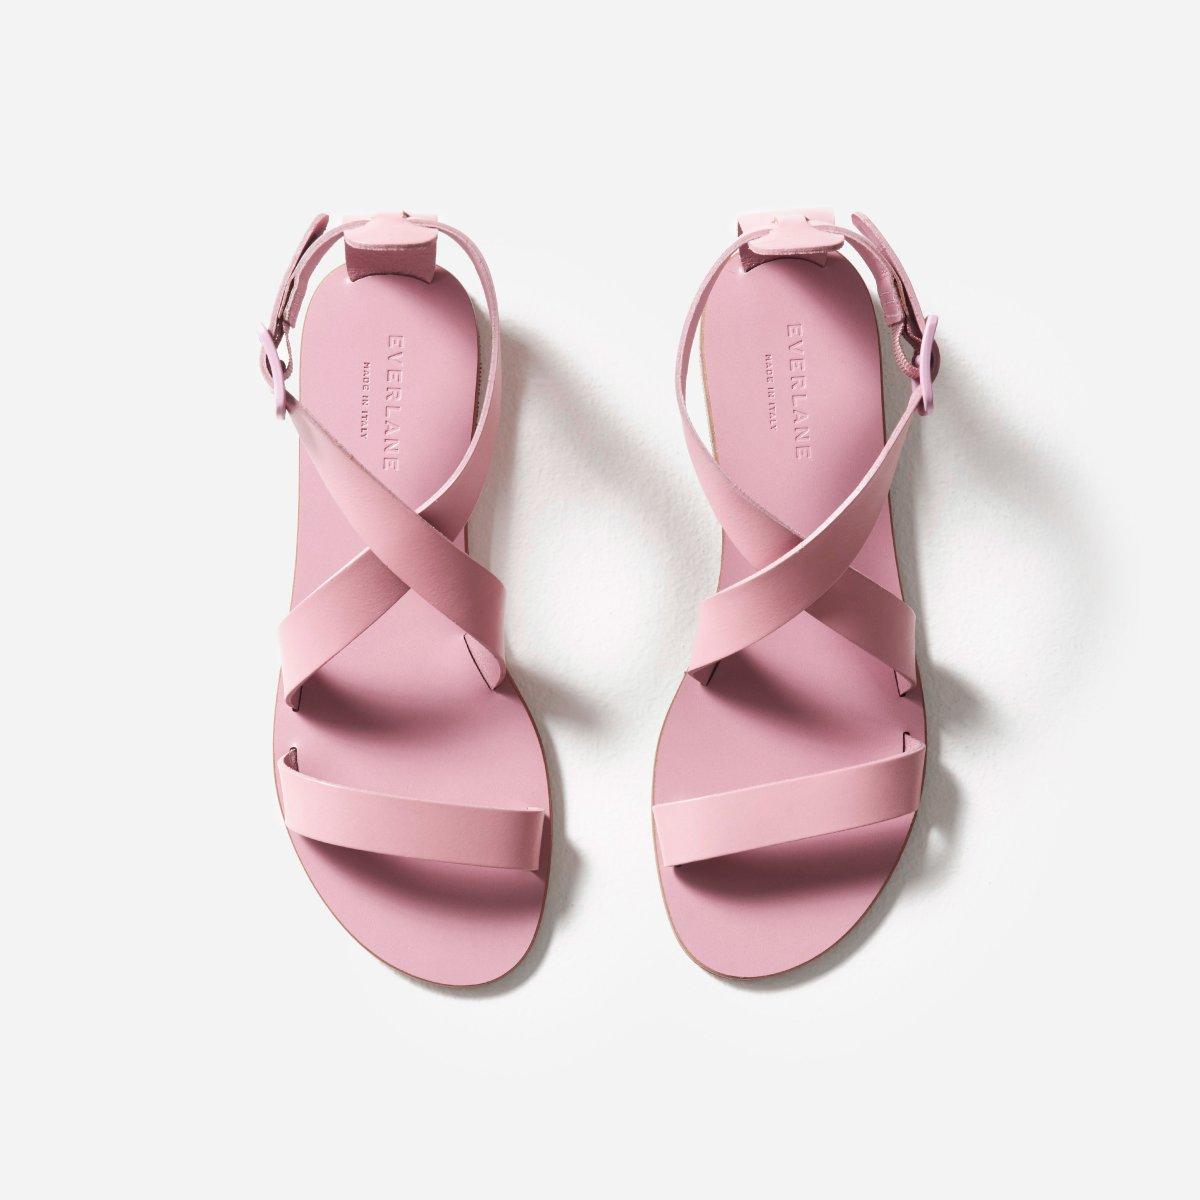 Everlane Choose What You Pay / Pink Wrap Sandal - Sunshine Style, A Florida Based Fashion Blog